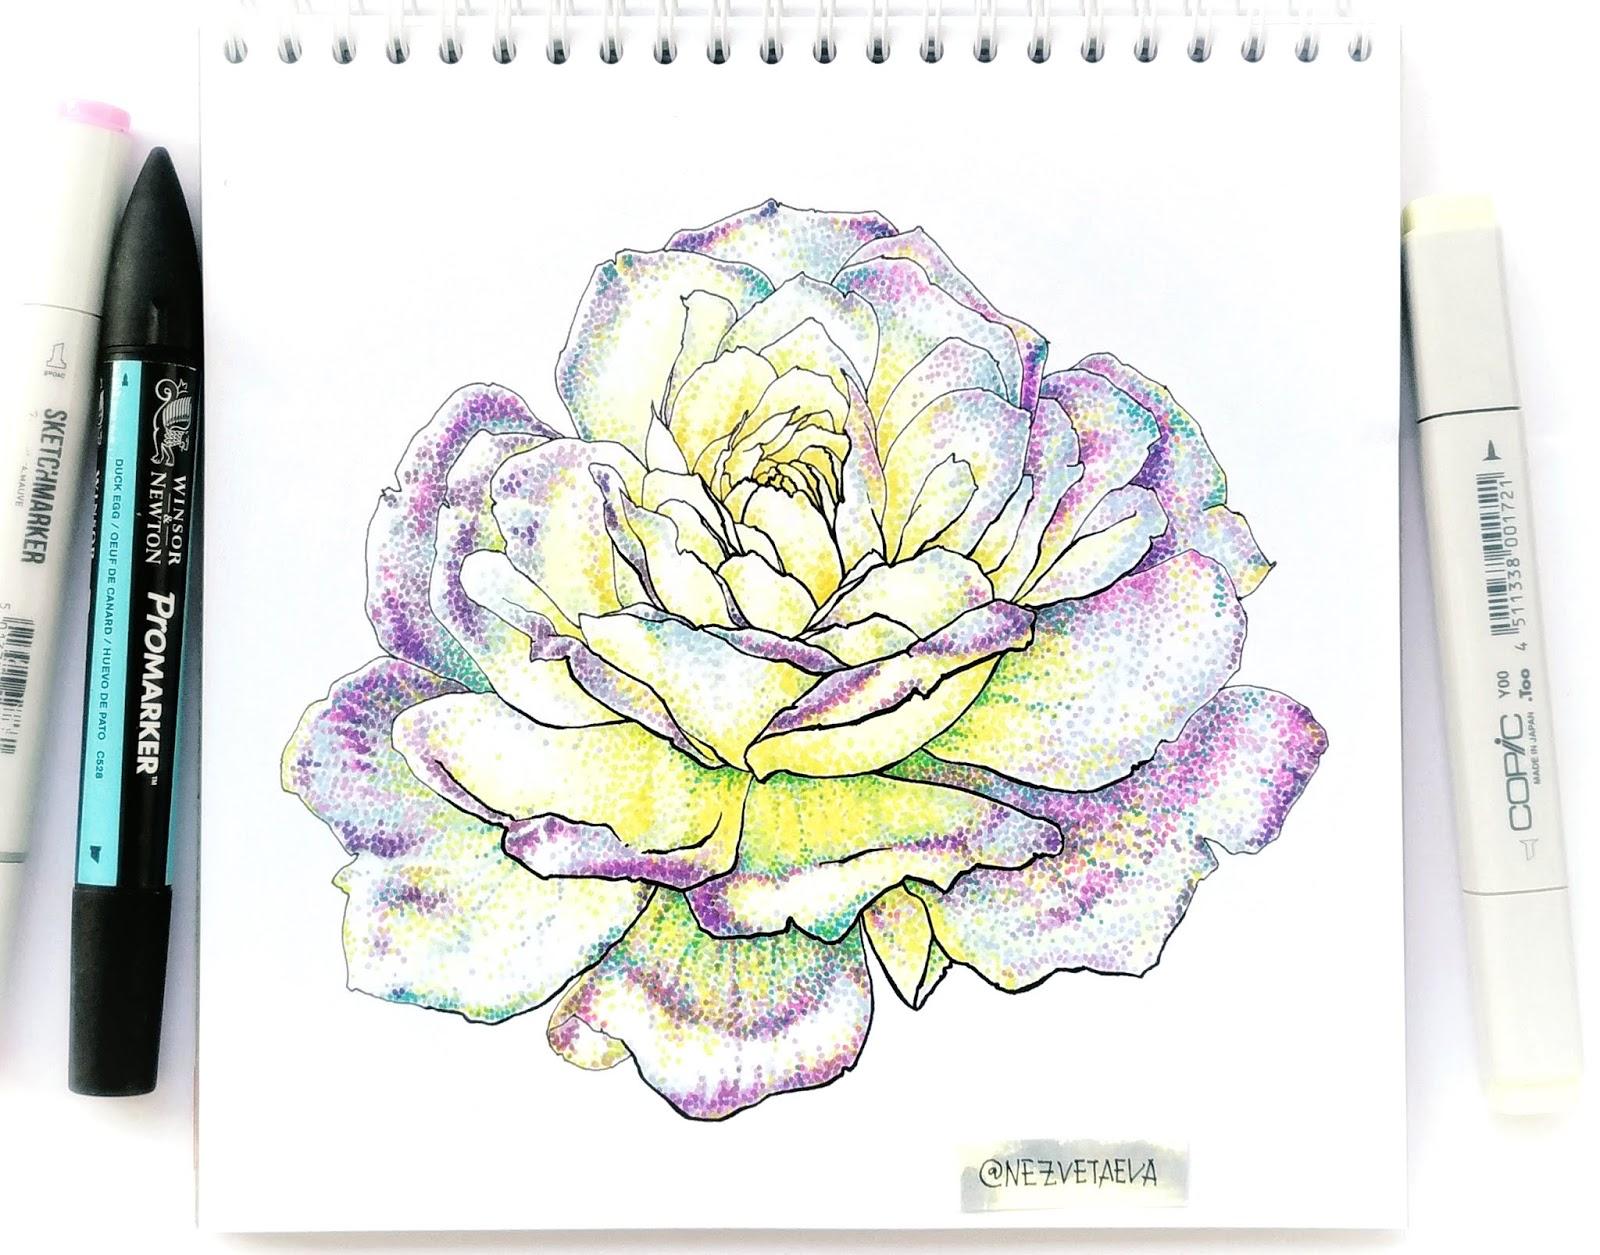 Rose, markers sketch, copic, promarkers, sketchmarker, flower sketch, dotwork, Nezvetaeva, Sonia Nezvetaeva